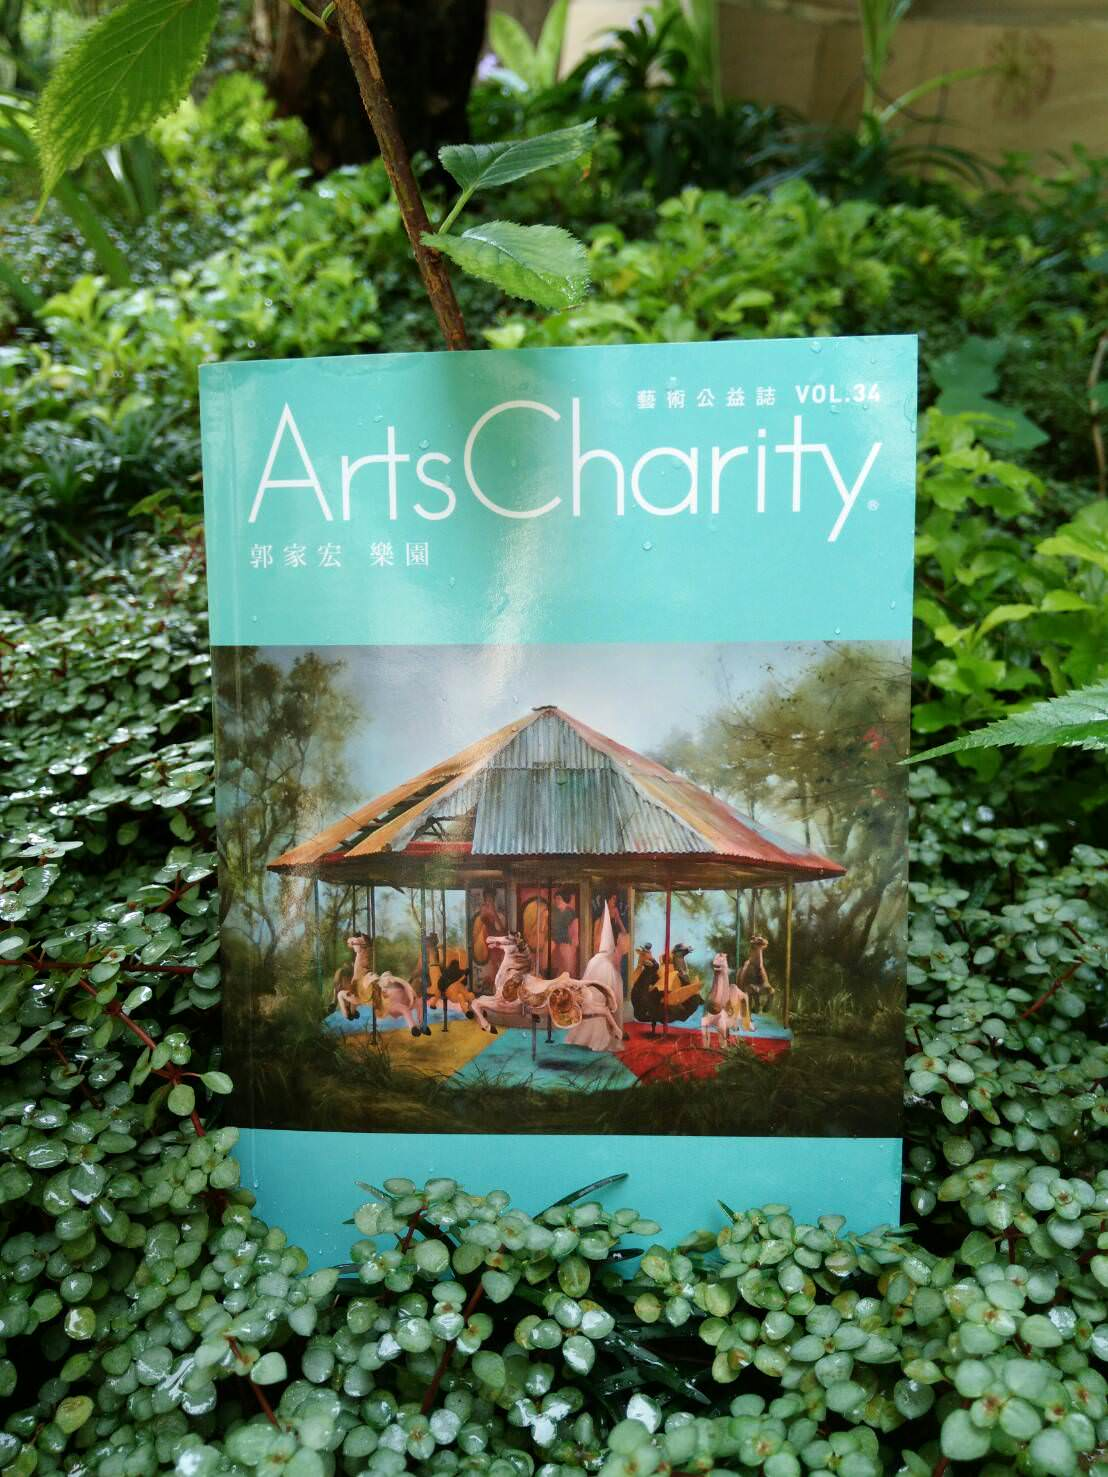 感謝「Arts Charity」藝術公益誌VOL.34號報導